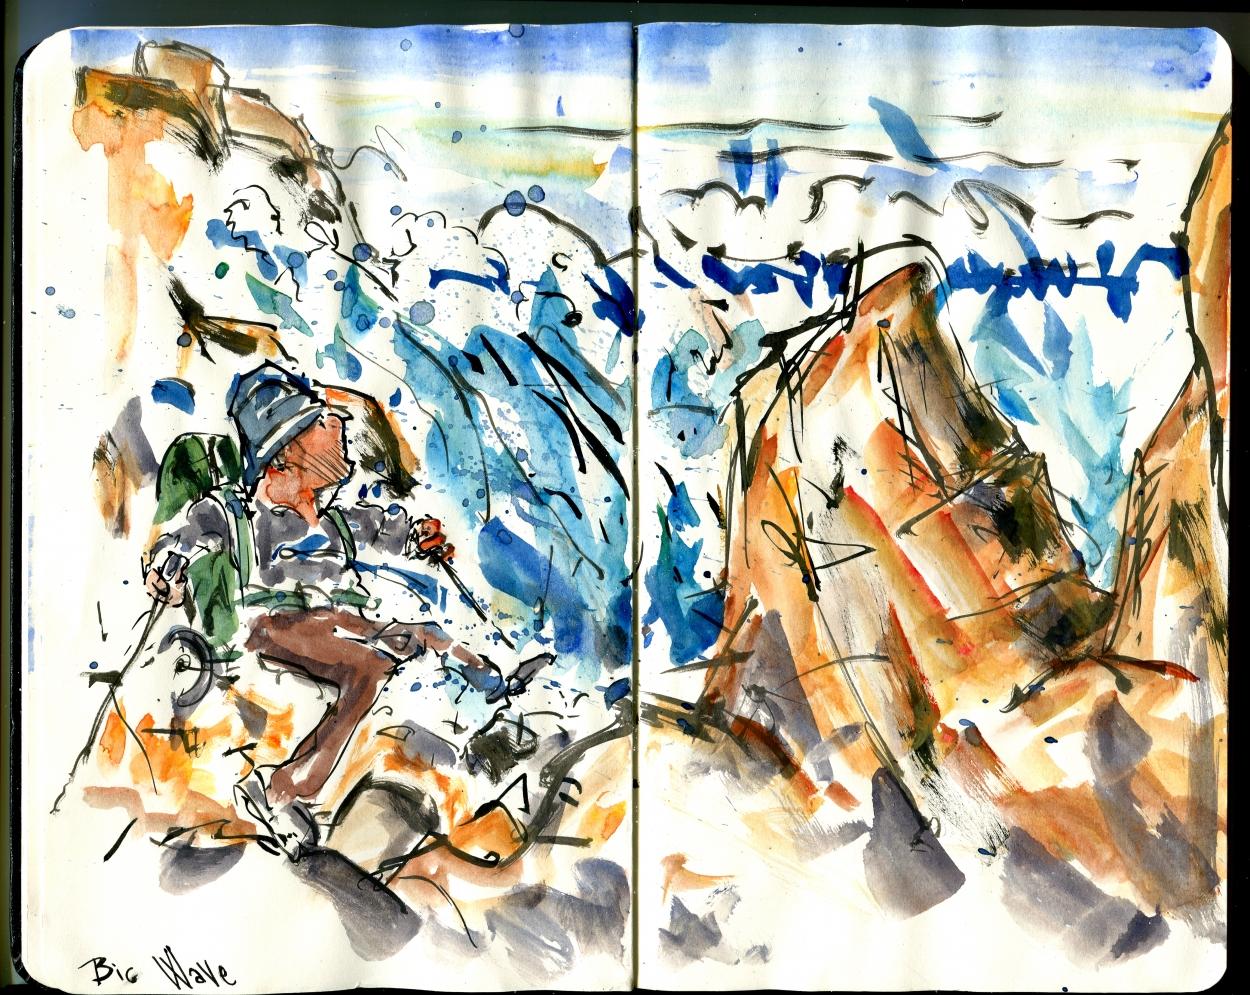 Walking in Rocks - Moleskine Hiking Sketch from Bornholm